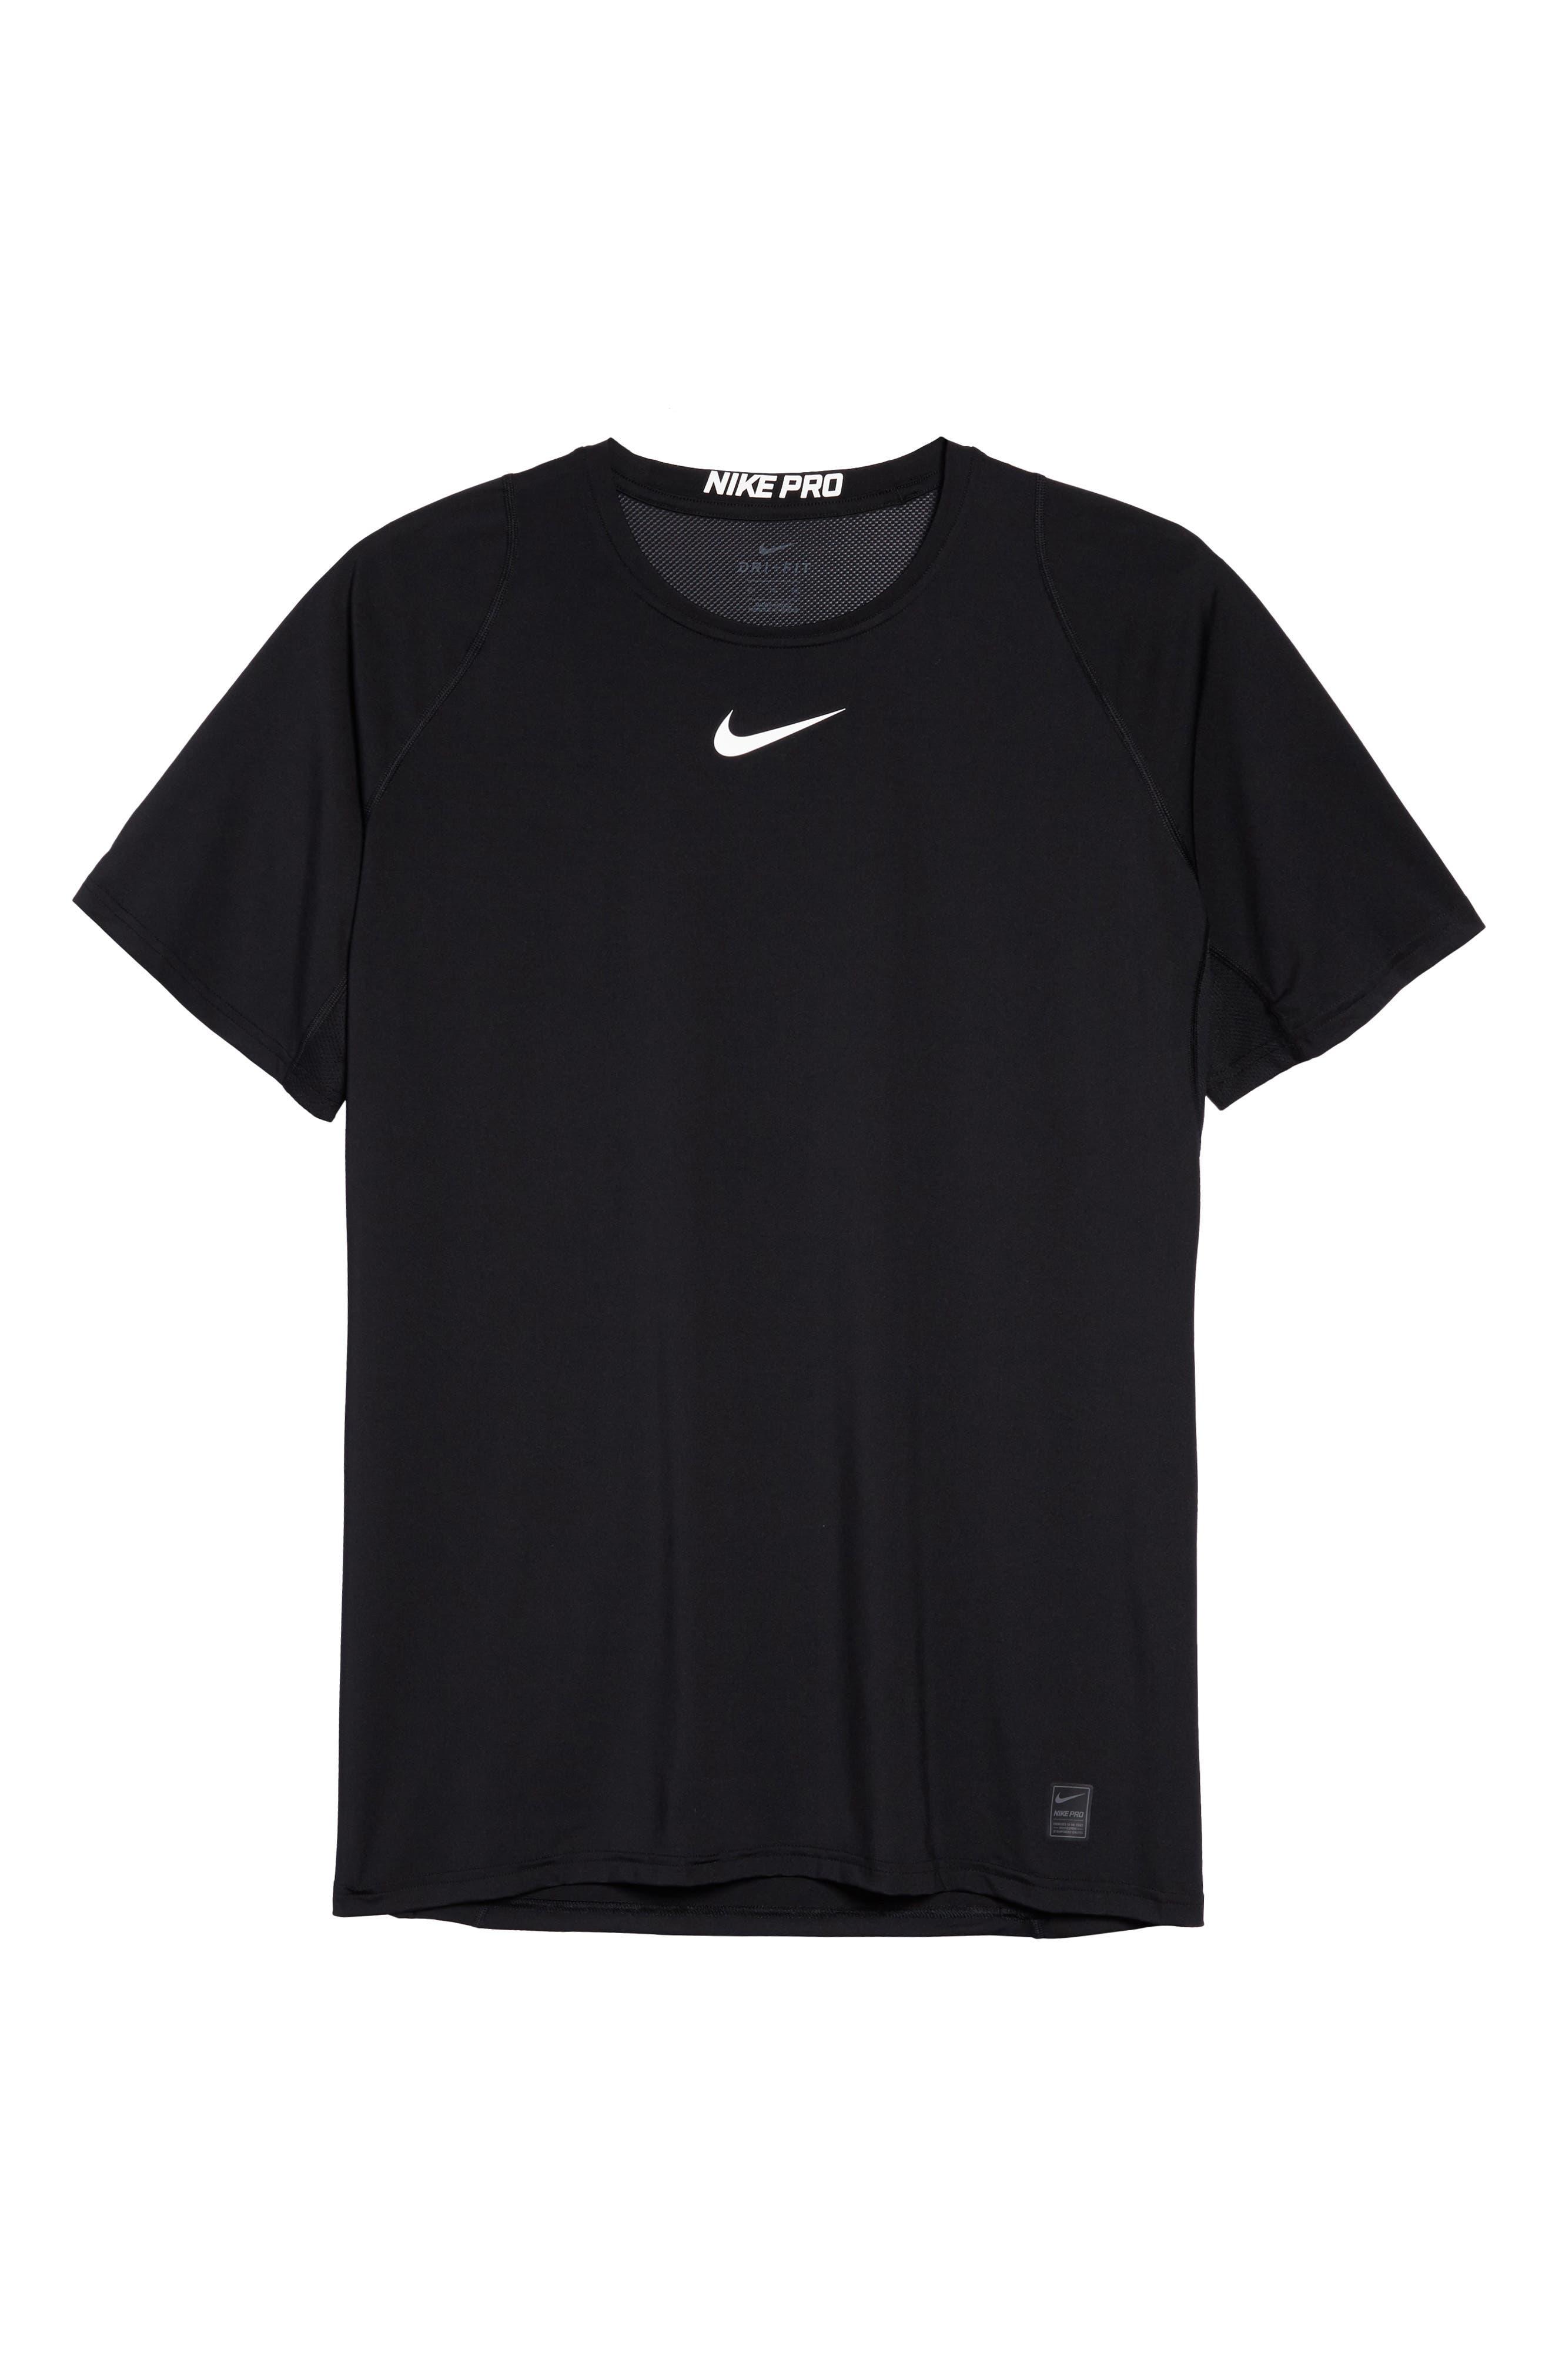 Pro Fitted T-Shirt,                             Alternate thumbnail 6, color,                             Black/White/White